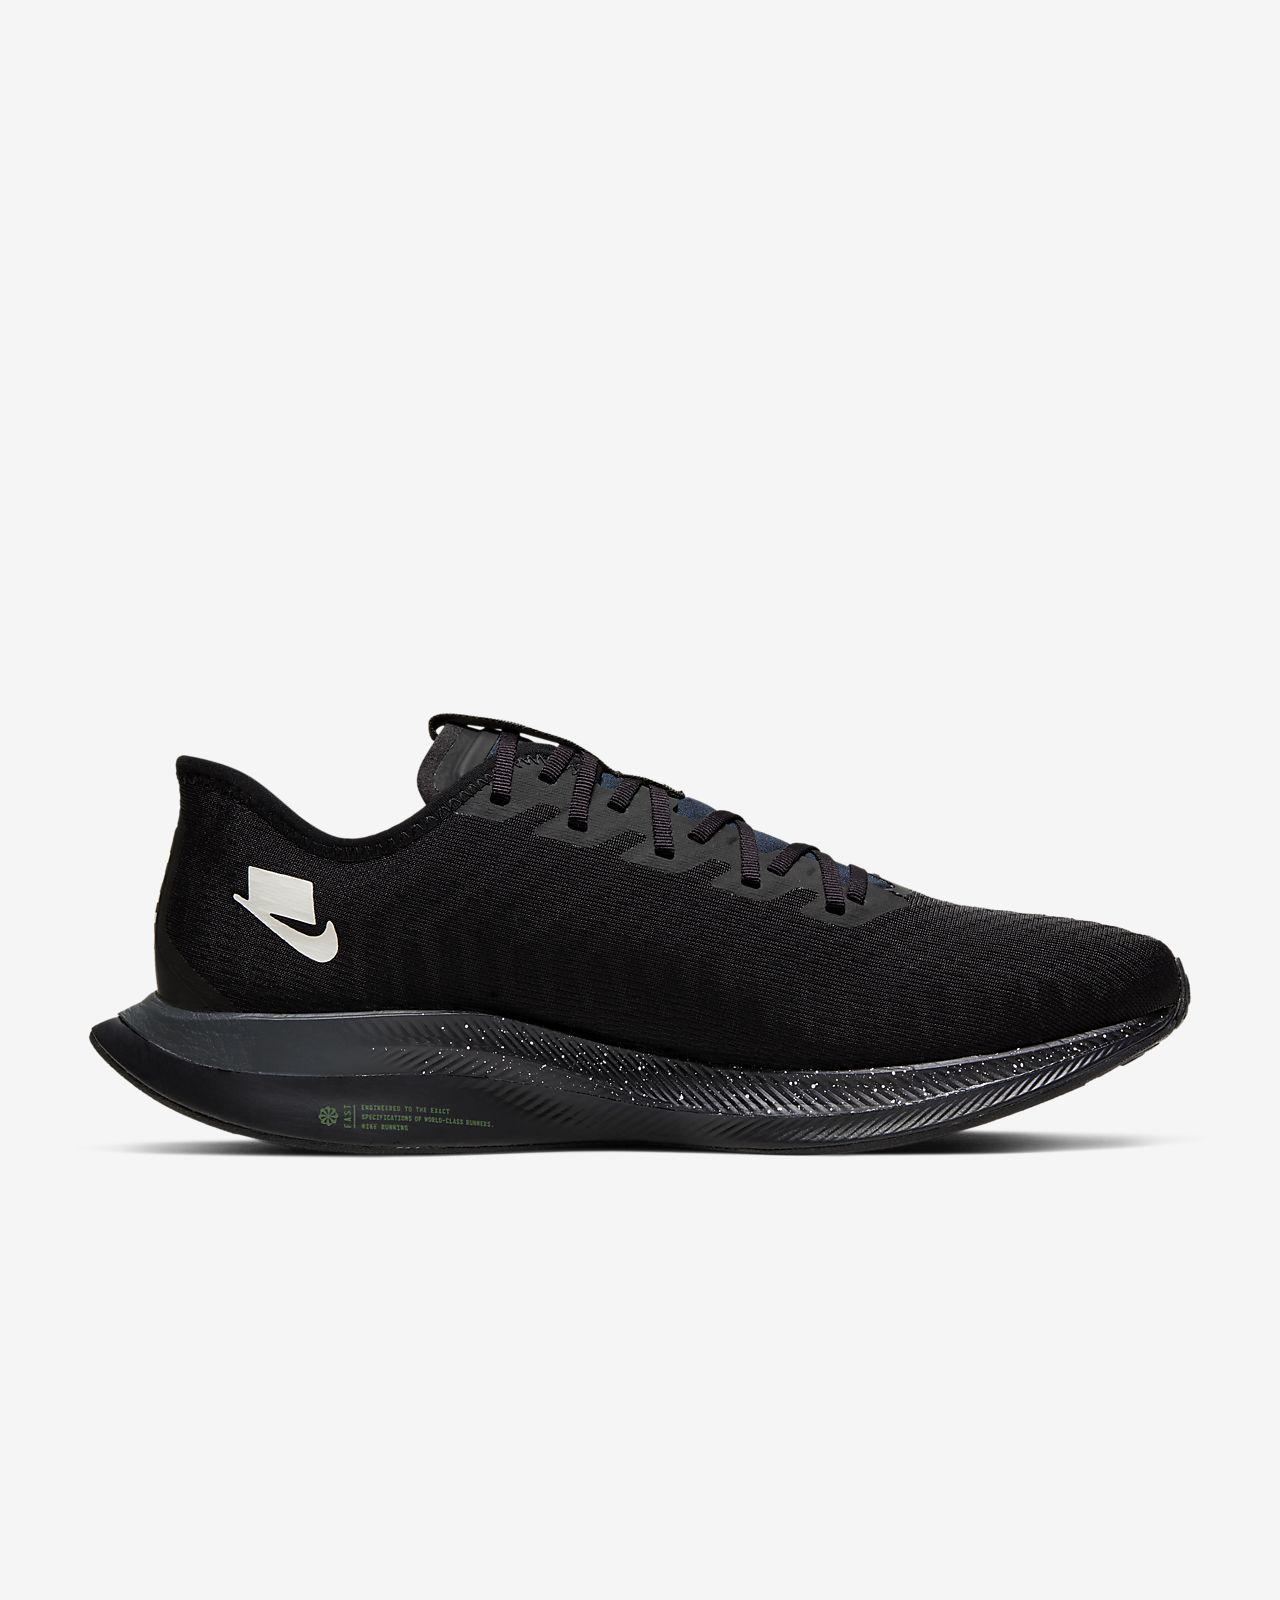 Nike Air Zoom Pegasus 36 Premium Women's Running Shoes HO19